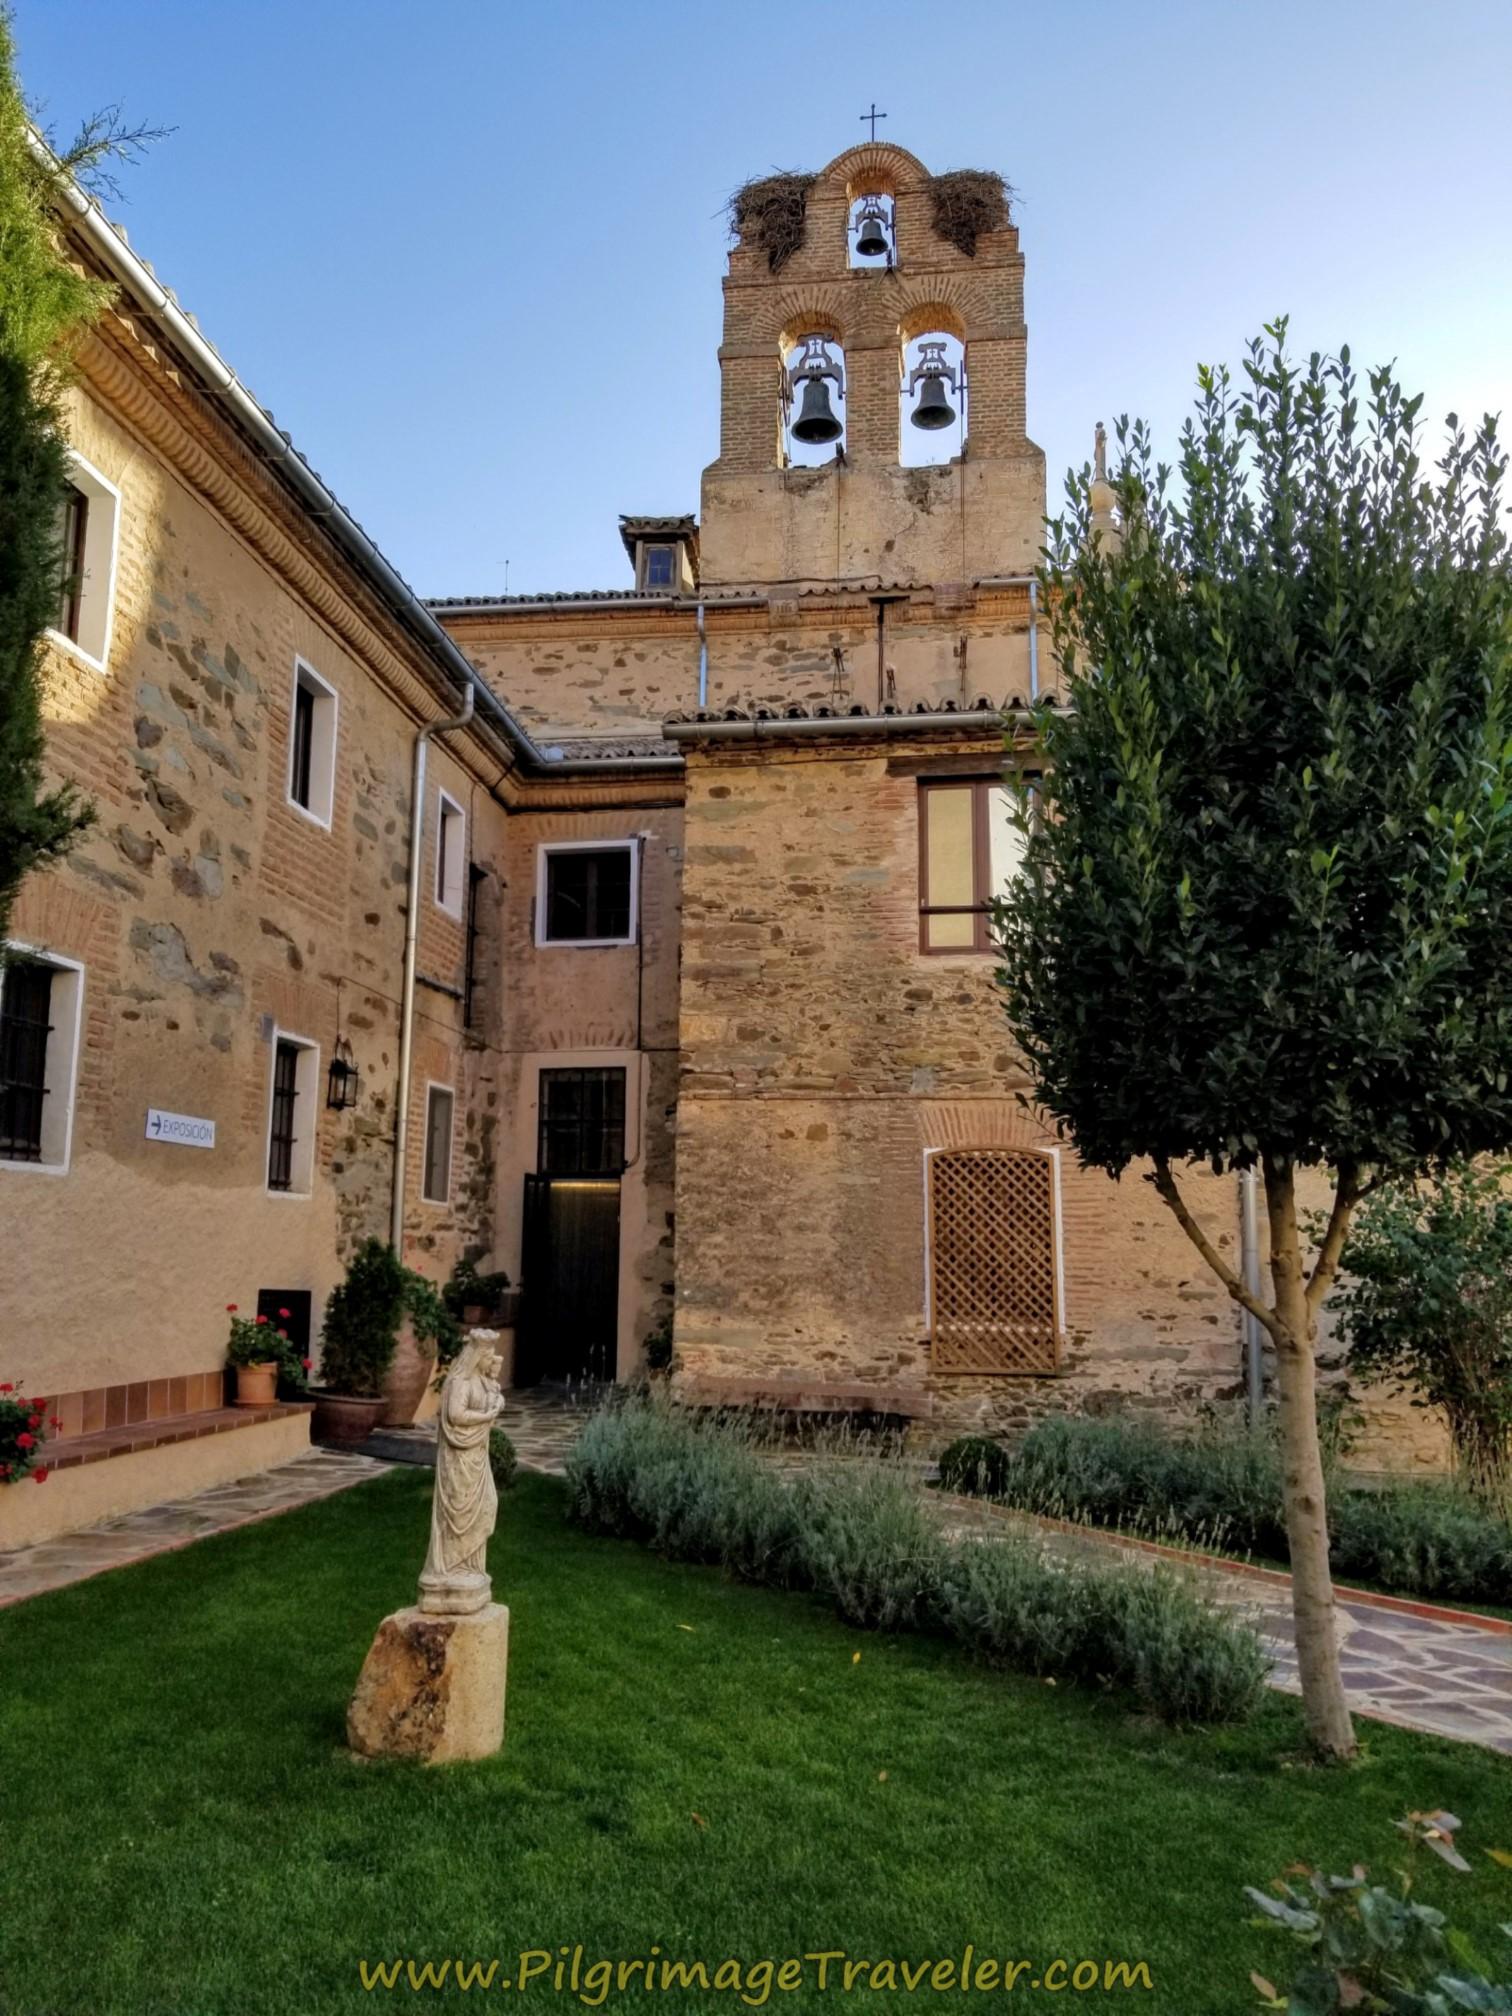 Convento Carmelitas Gardens, Centro Teresiano Sanjuanista, Alba de Tormes